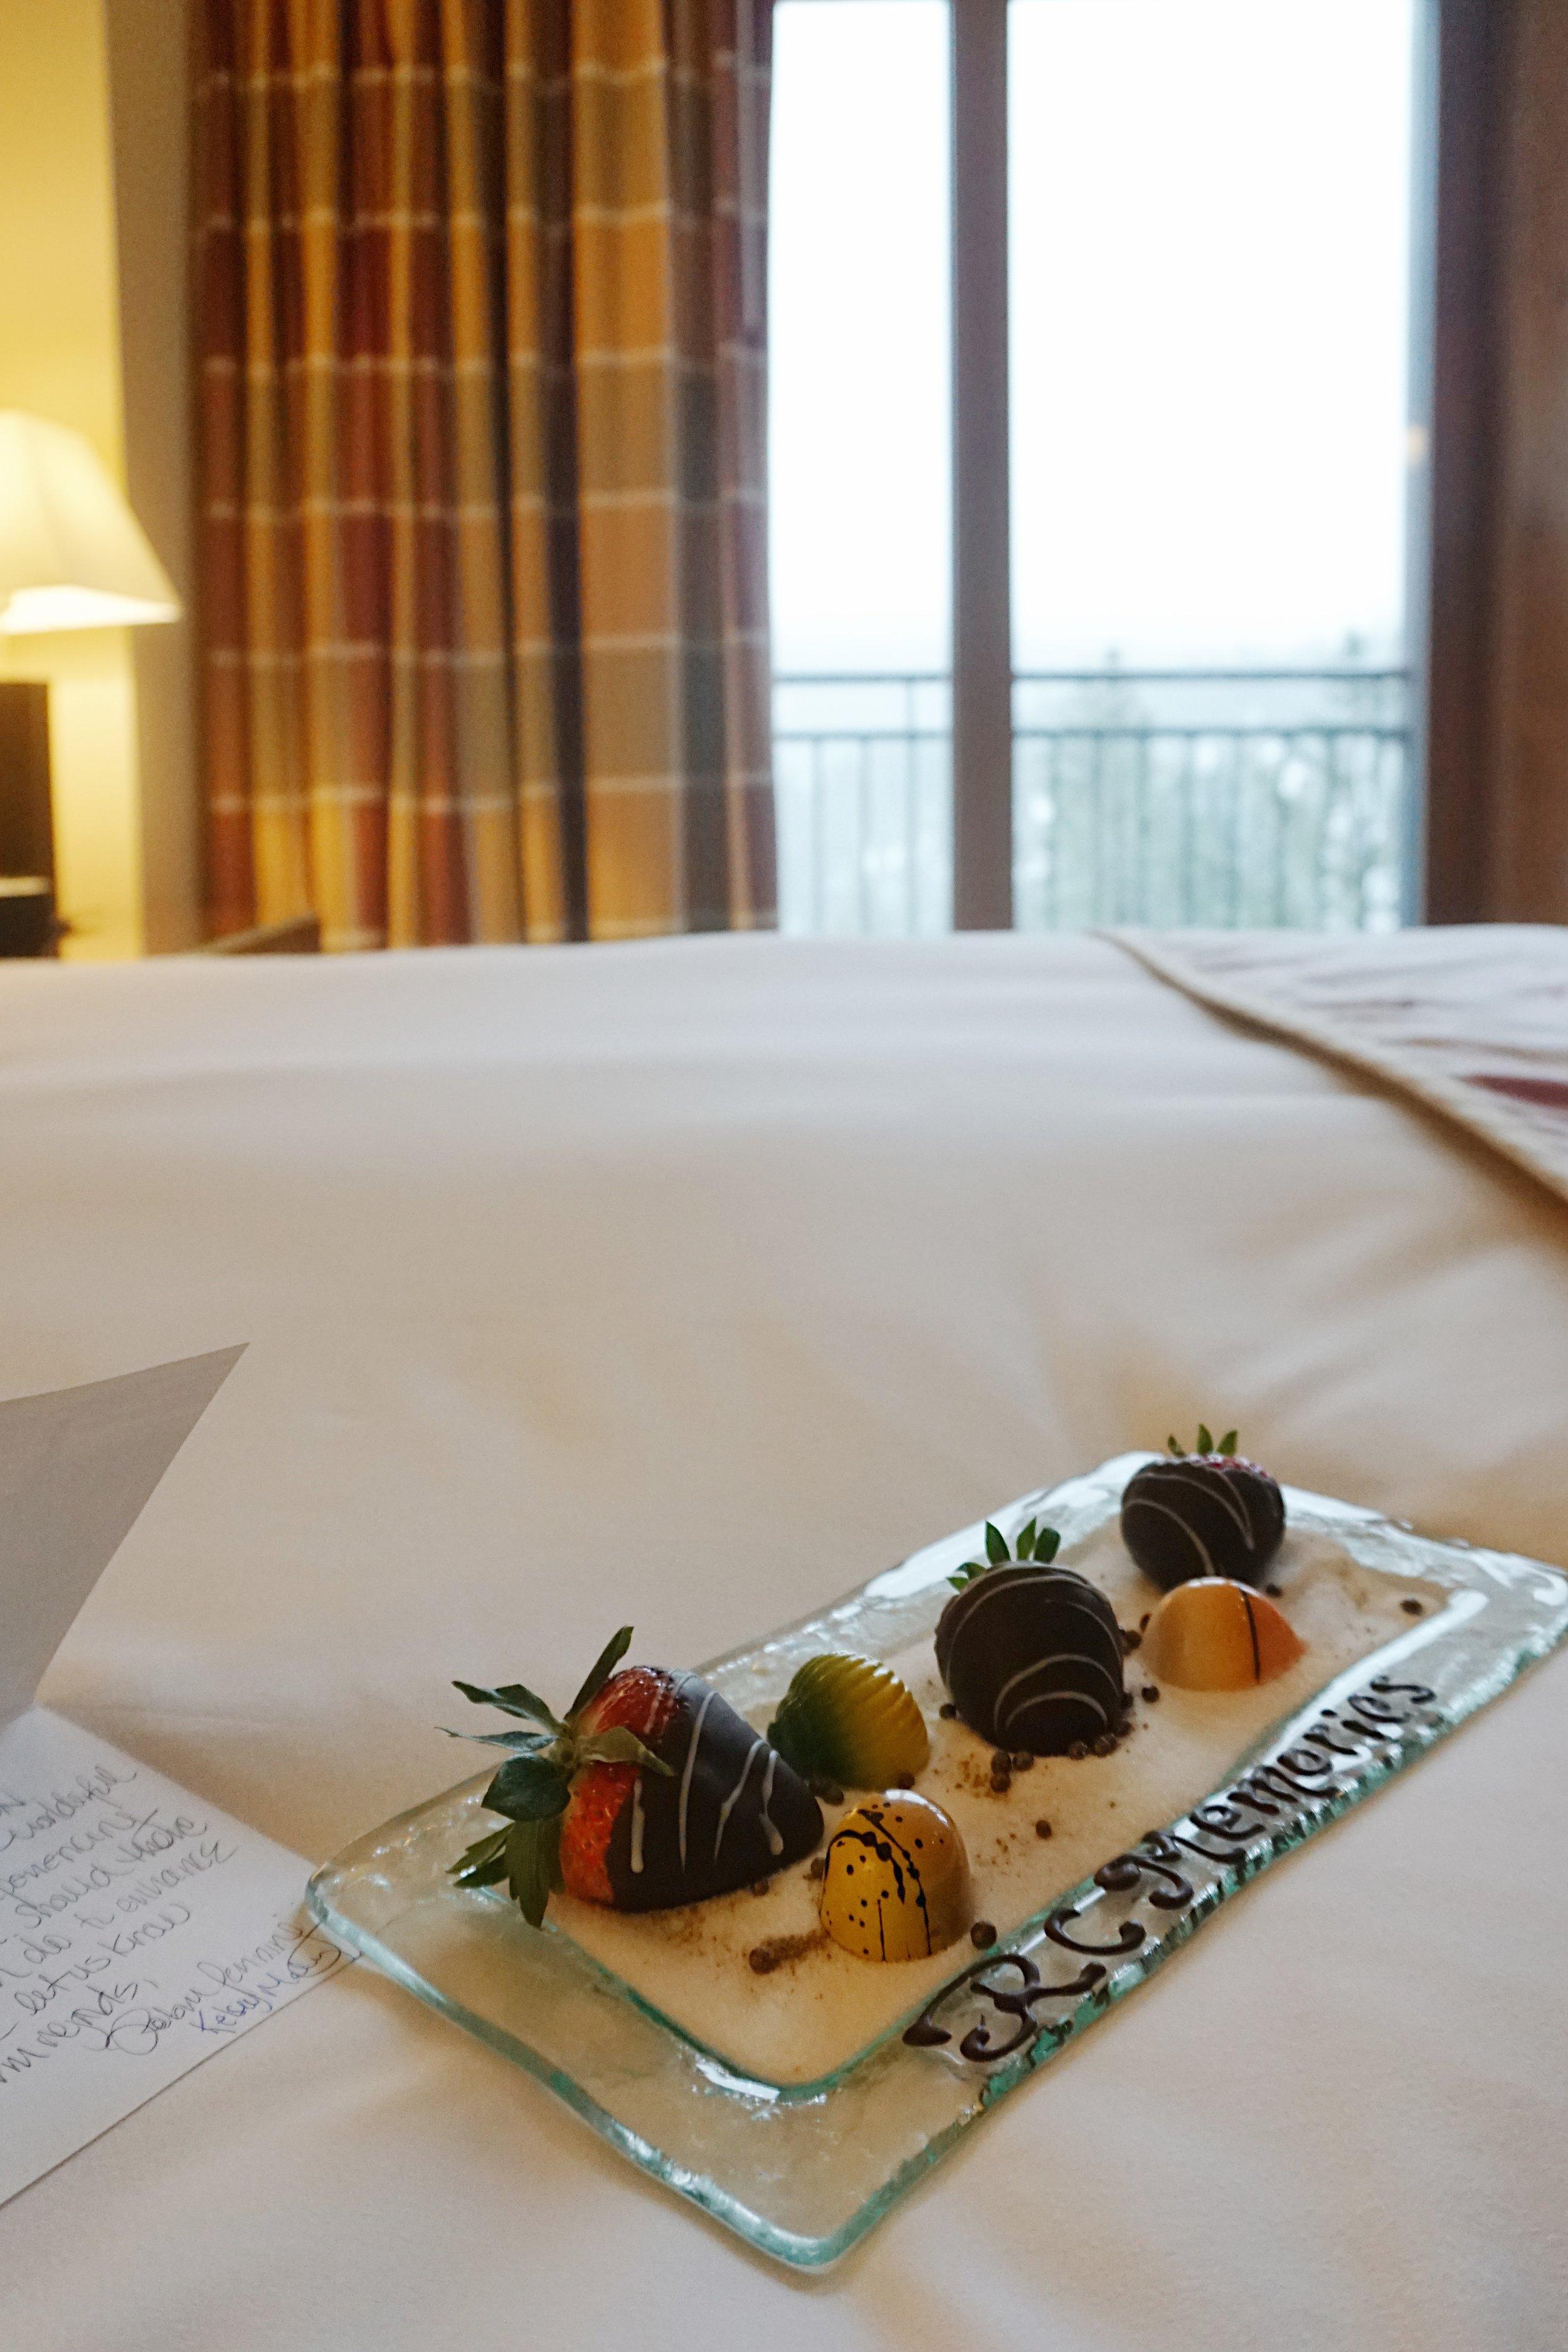 Julia Friedman's stay at the Ritz Carlton in Lake Tahoe.